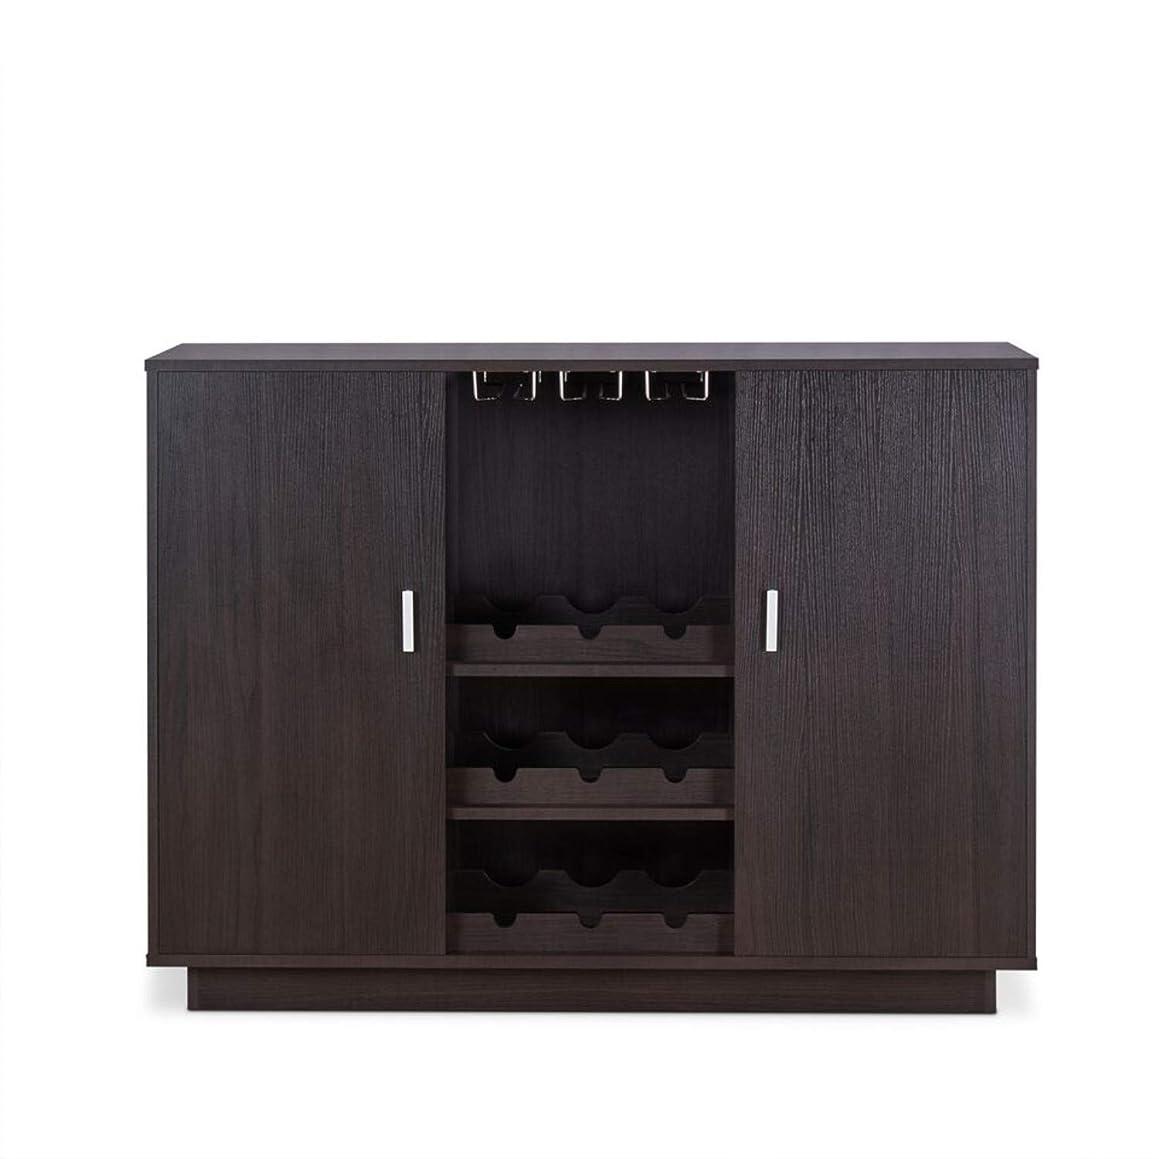 Benjara BM193791 Wooden Server with Two Side Door Storage Cabinets, Brown